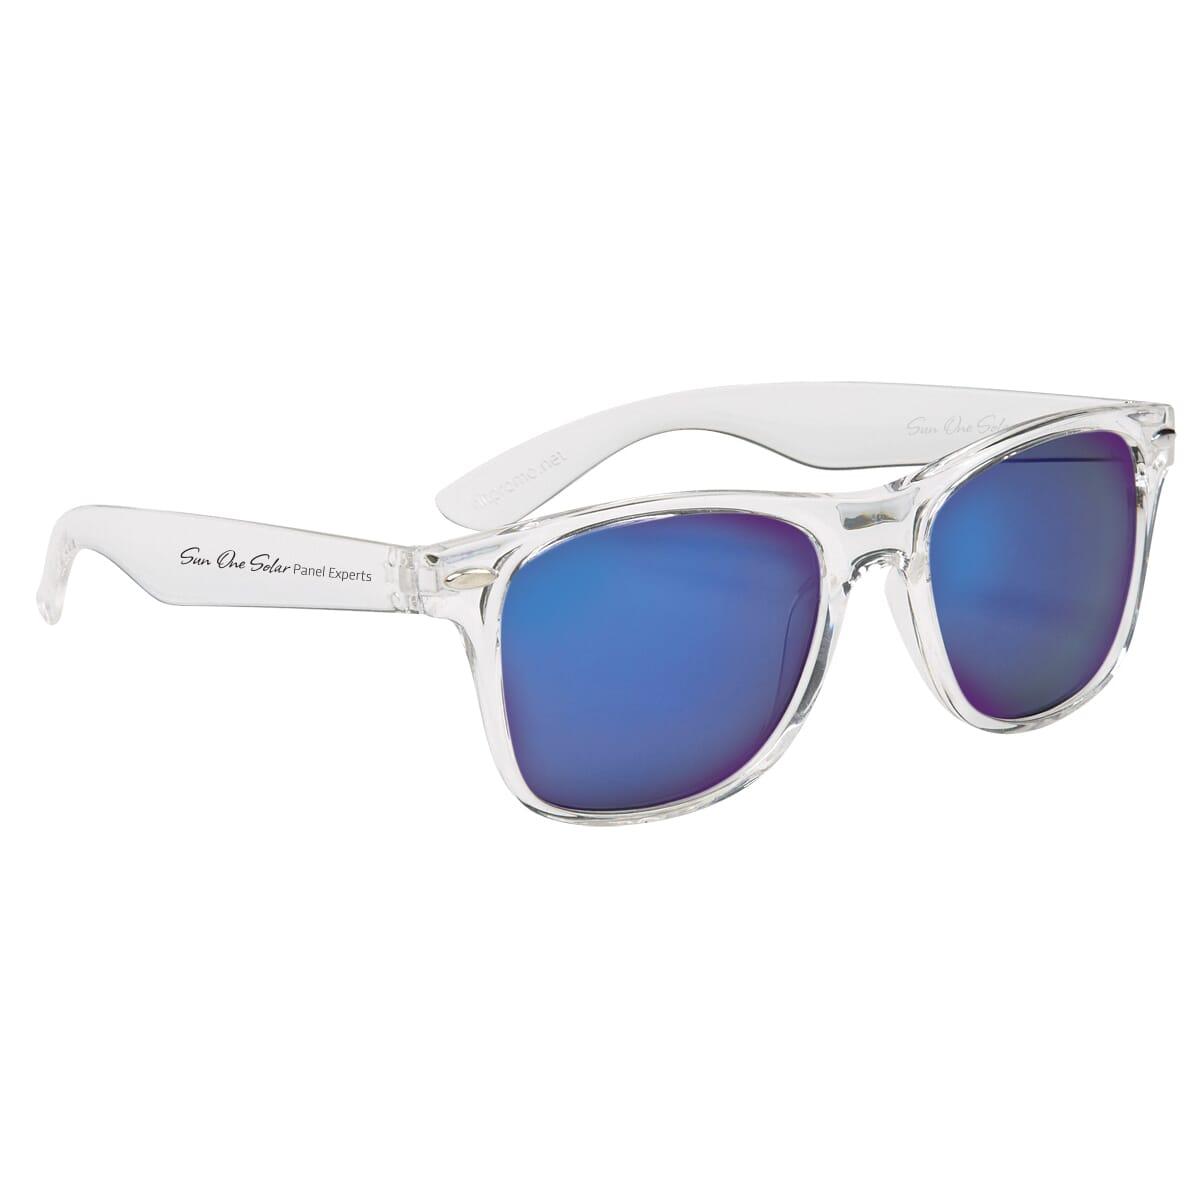 Crystalline Cruise Retro Sunglasses